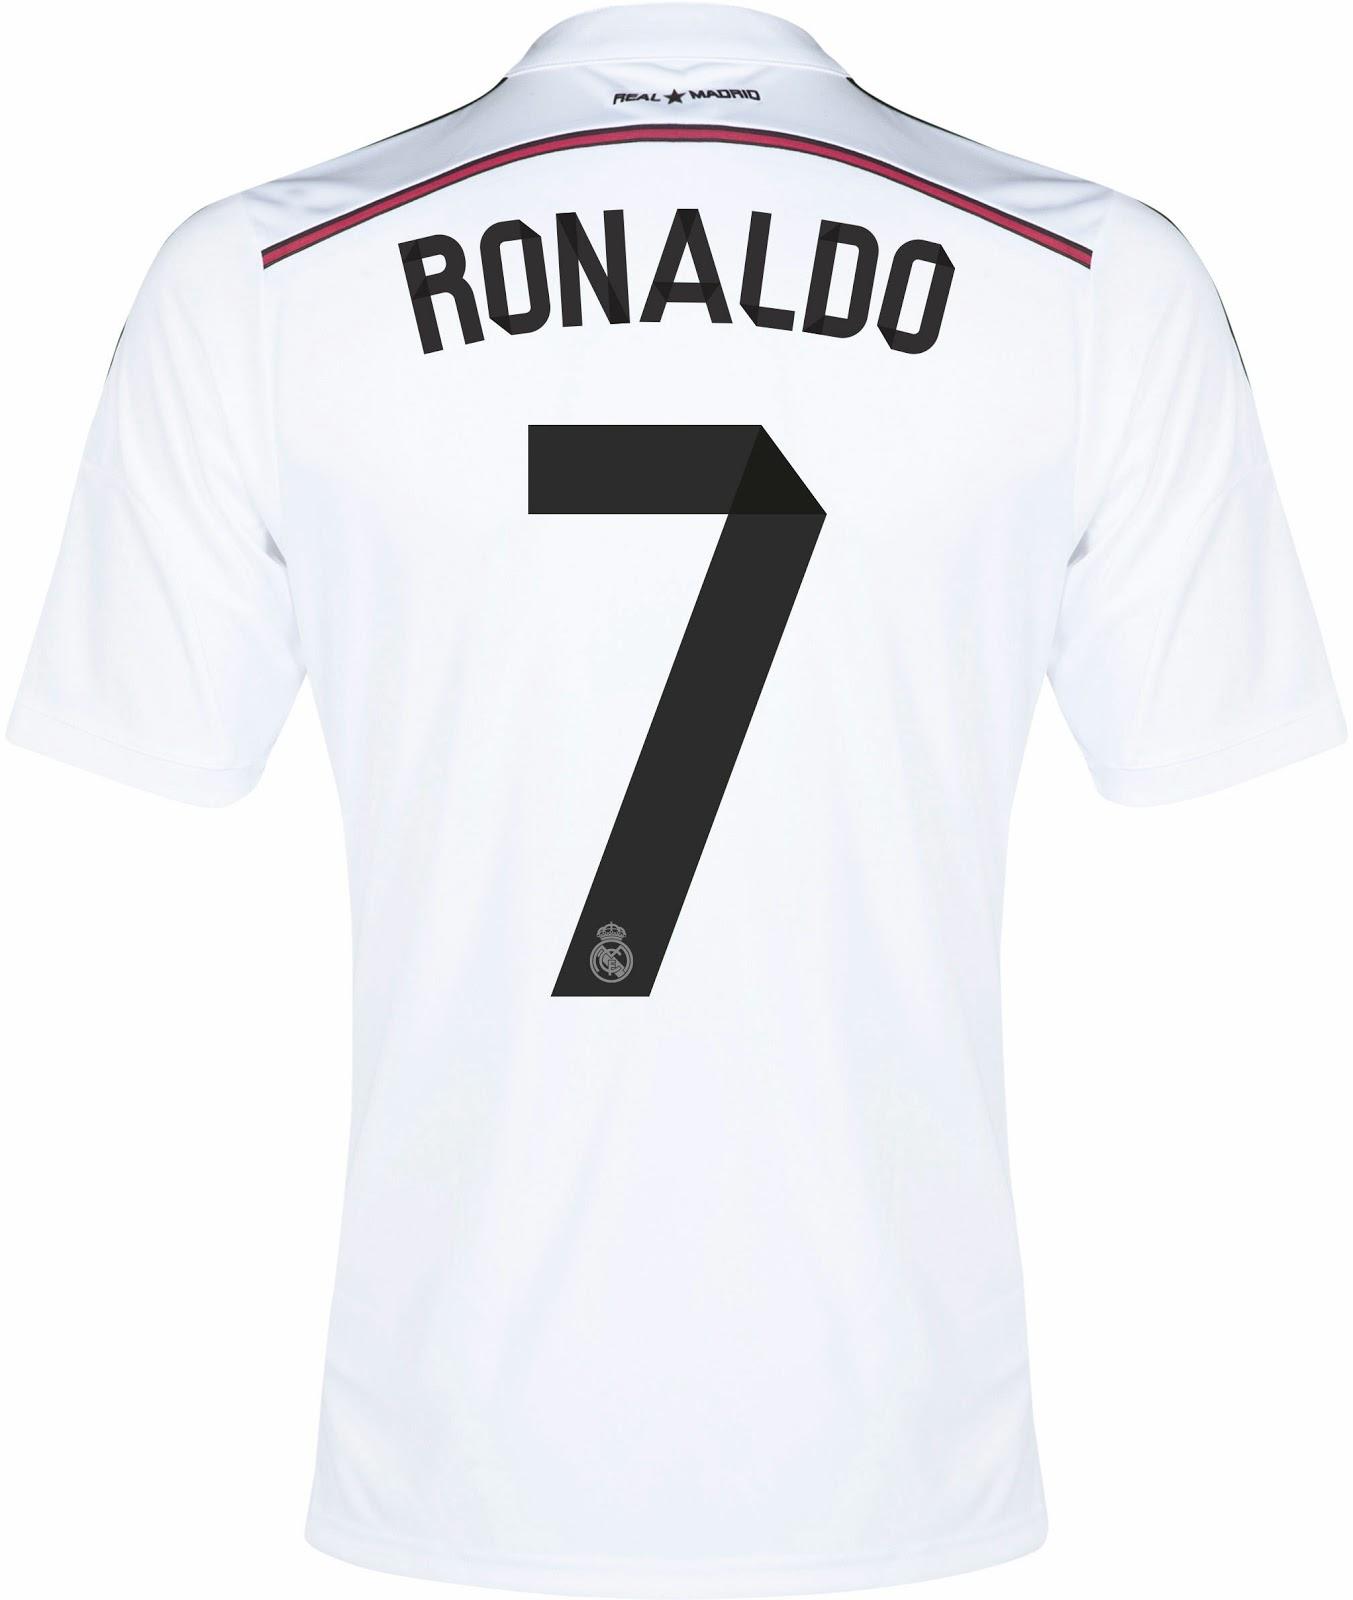 Real Madrid Font Please! - forum dafont.com